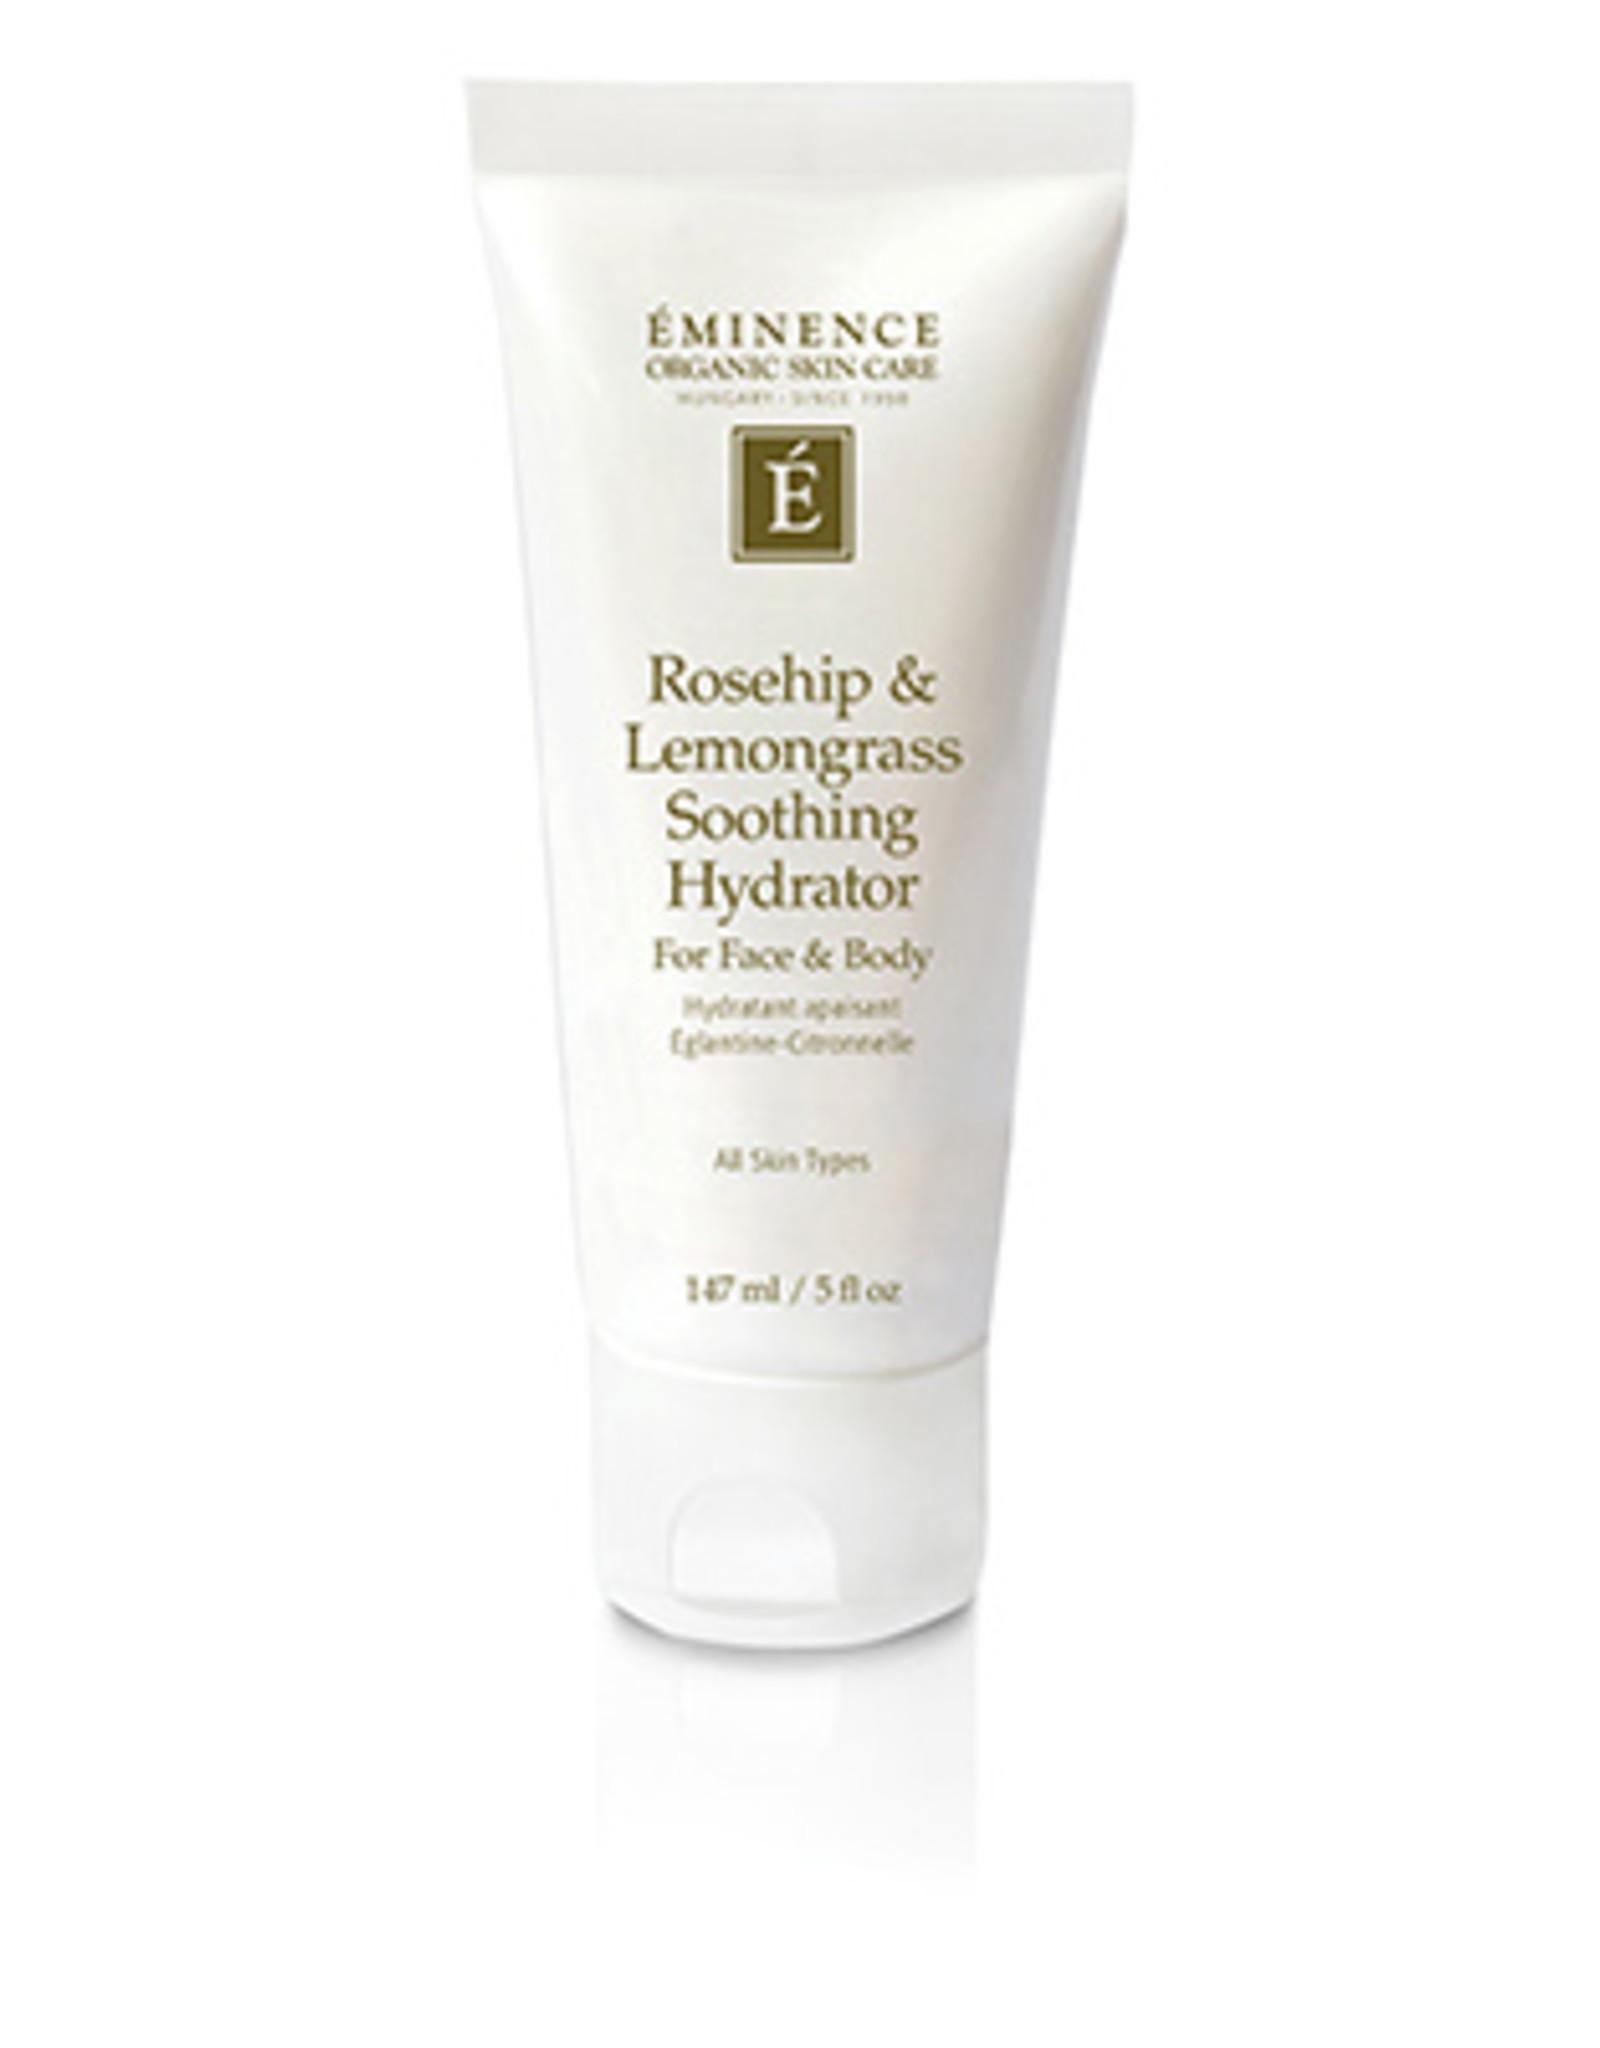 Eminence Organic Skin Care Rosehip & Lemongrass Soothing Hydrator for Face & Body*